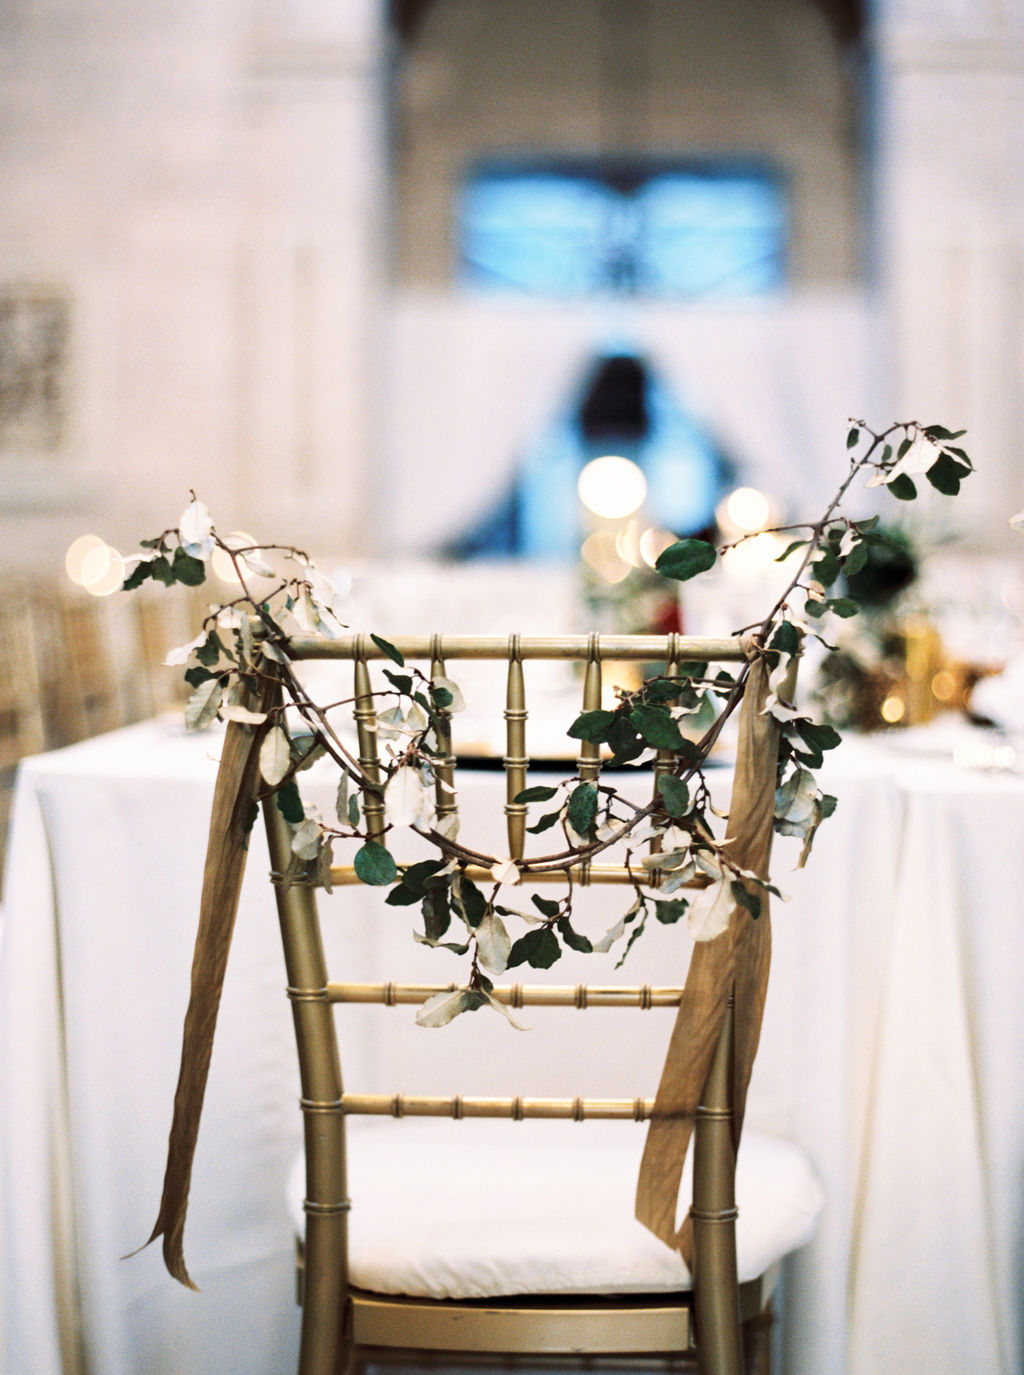 Kyle-Menna-Wedding-krmorenophoto-587.jpg